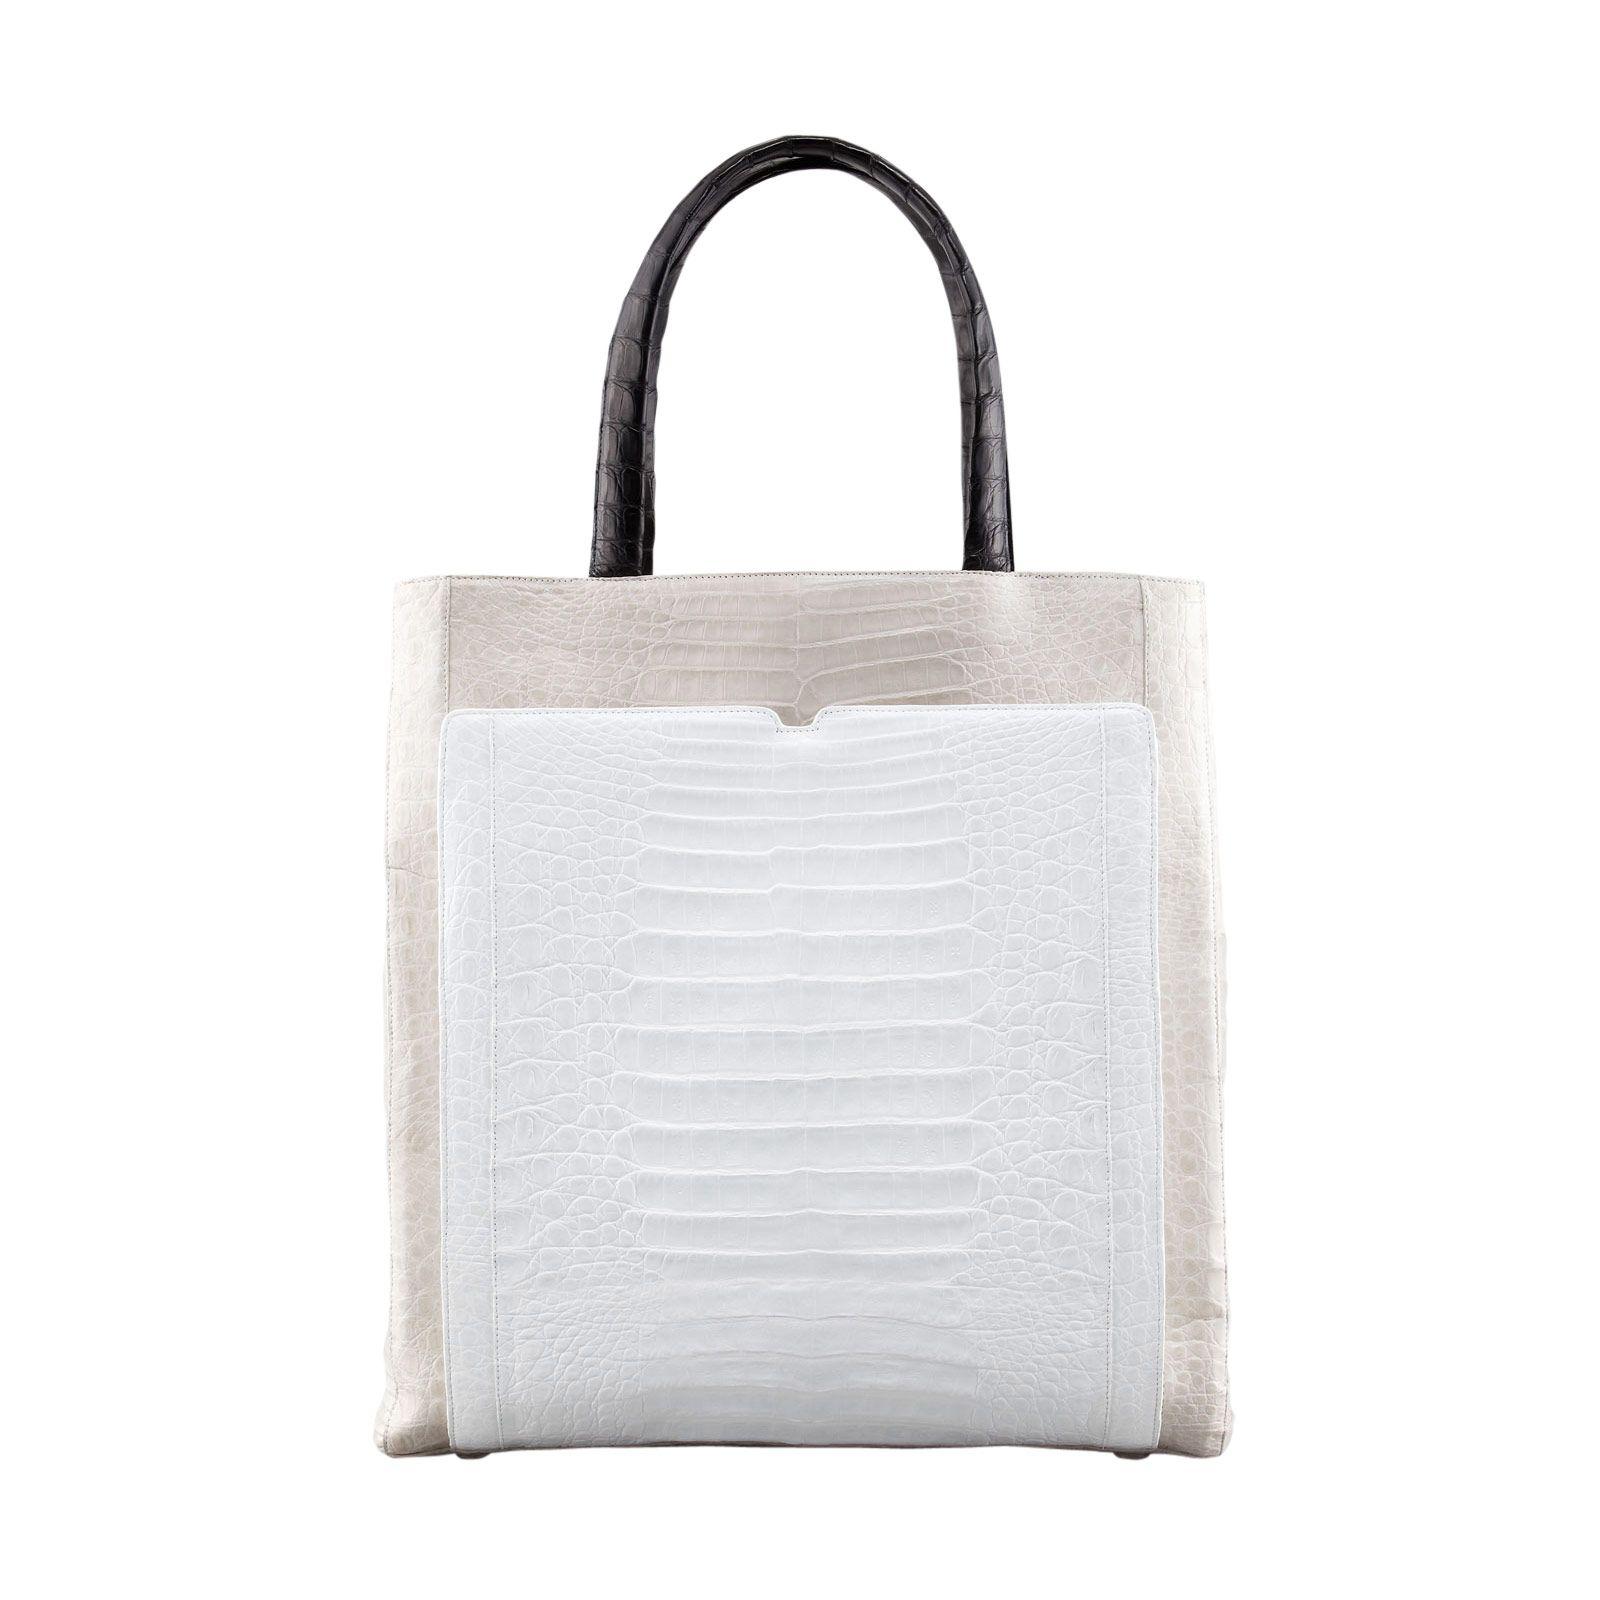 Nancy Gonzalez Crocodile Multicolor Shopper Bag